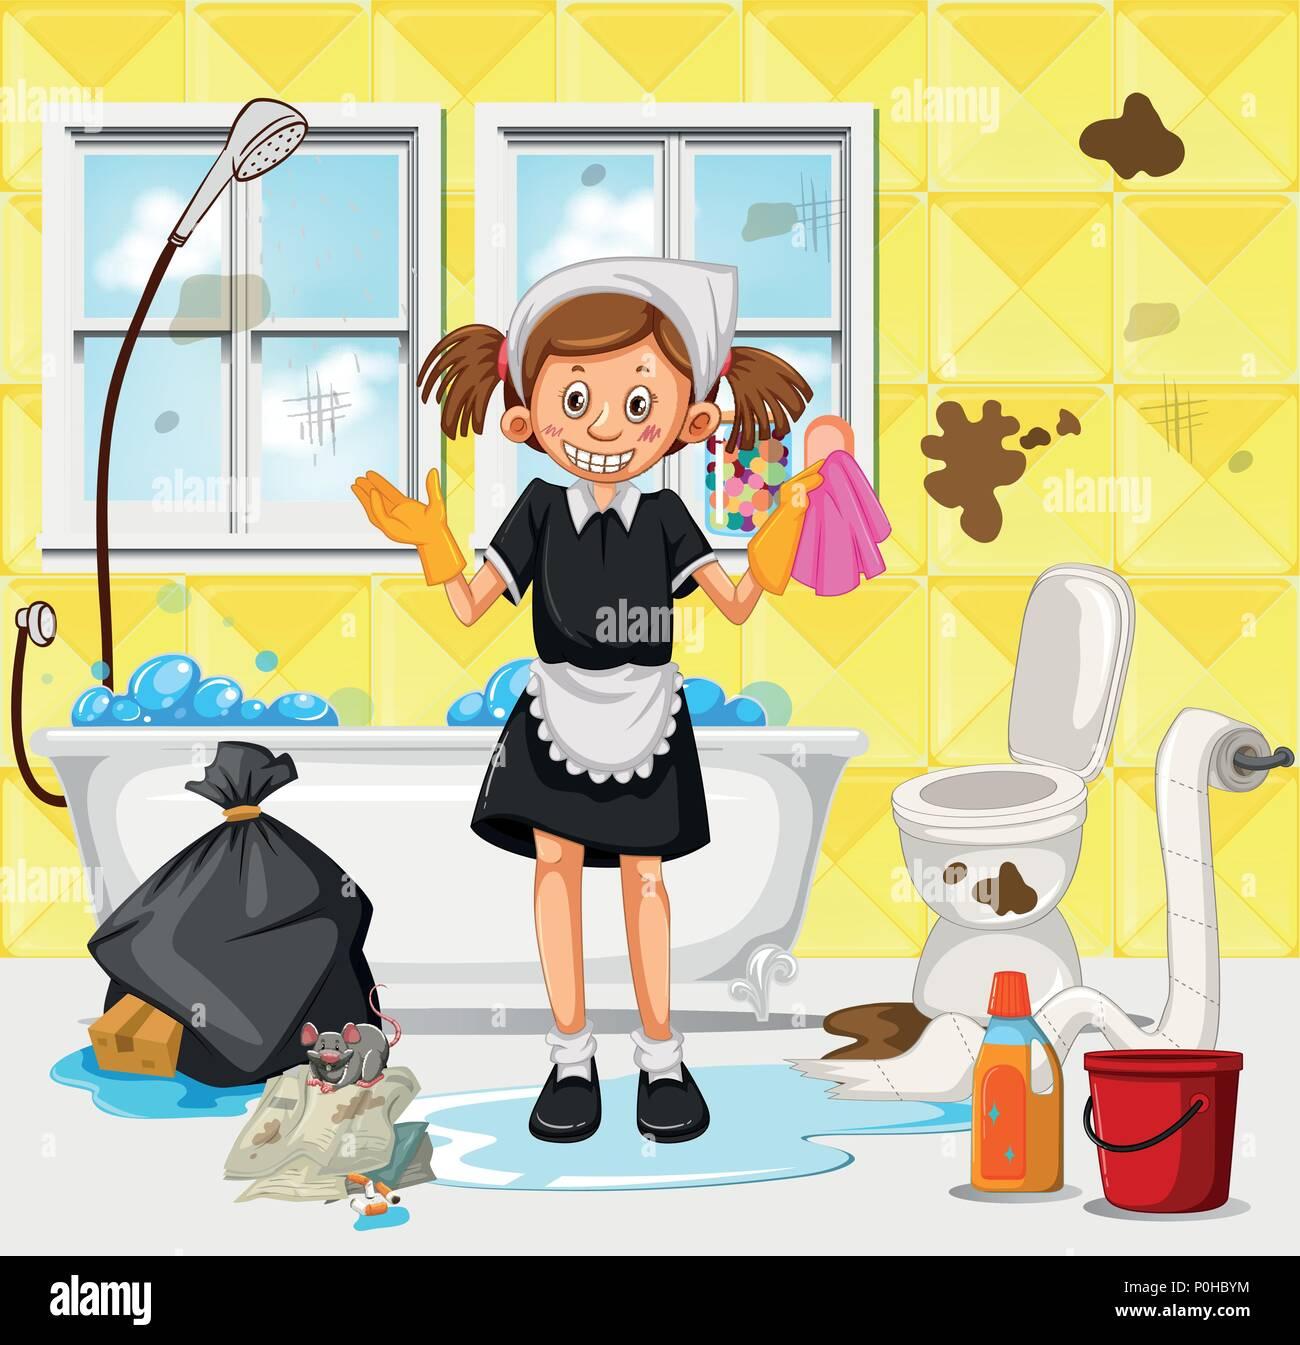 Dirty Bathroom Pics: A Maid Cleaning Dirty Bathroom Illustration Stock Vector